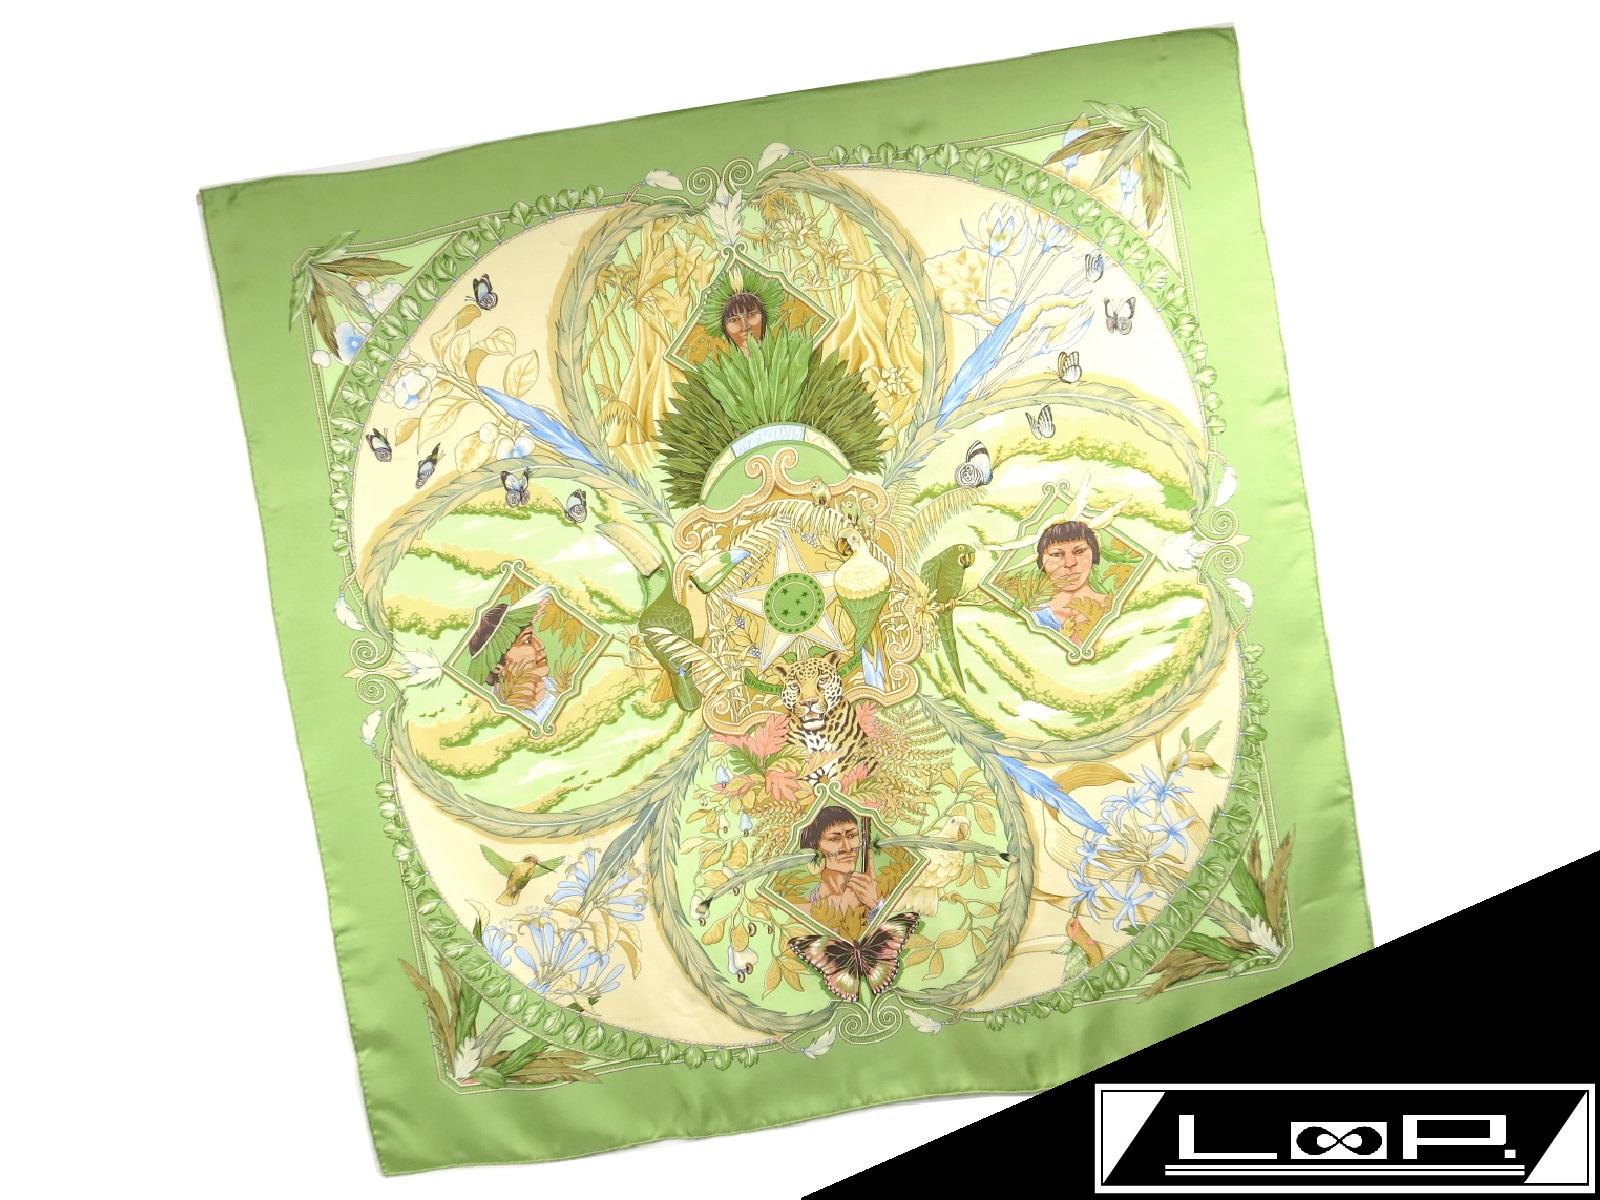 【SALE】【未使用】 HERMES エルメス カレ 90 AMAZONIA アマゾニア スカーフ グリーン 緑 イエロー 黄色 インディアン シルク 【A15559】 【中古】